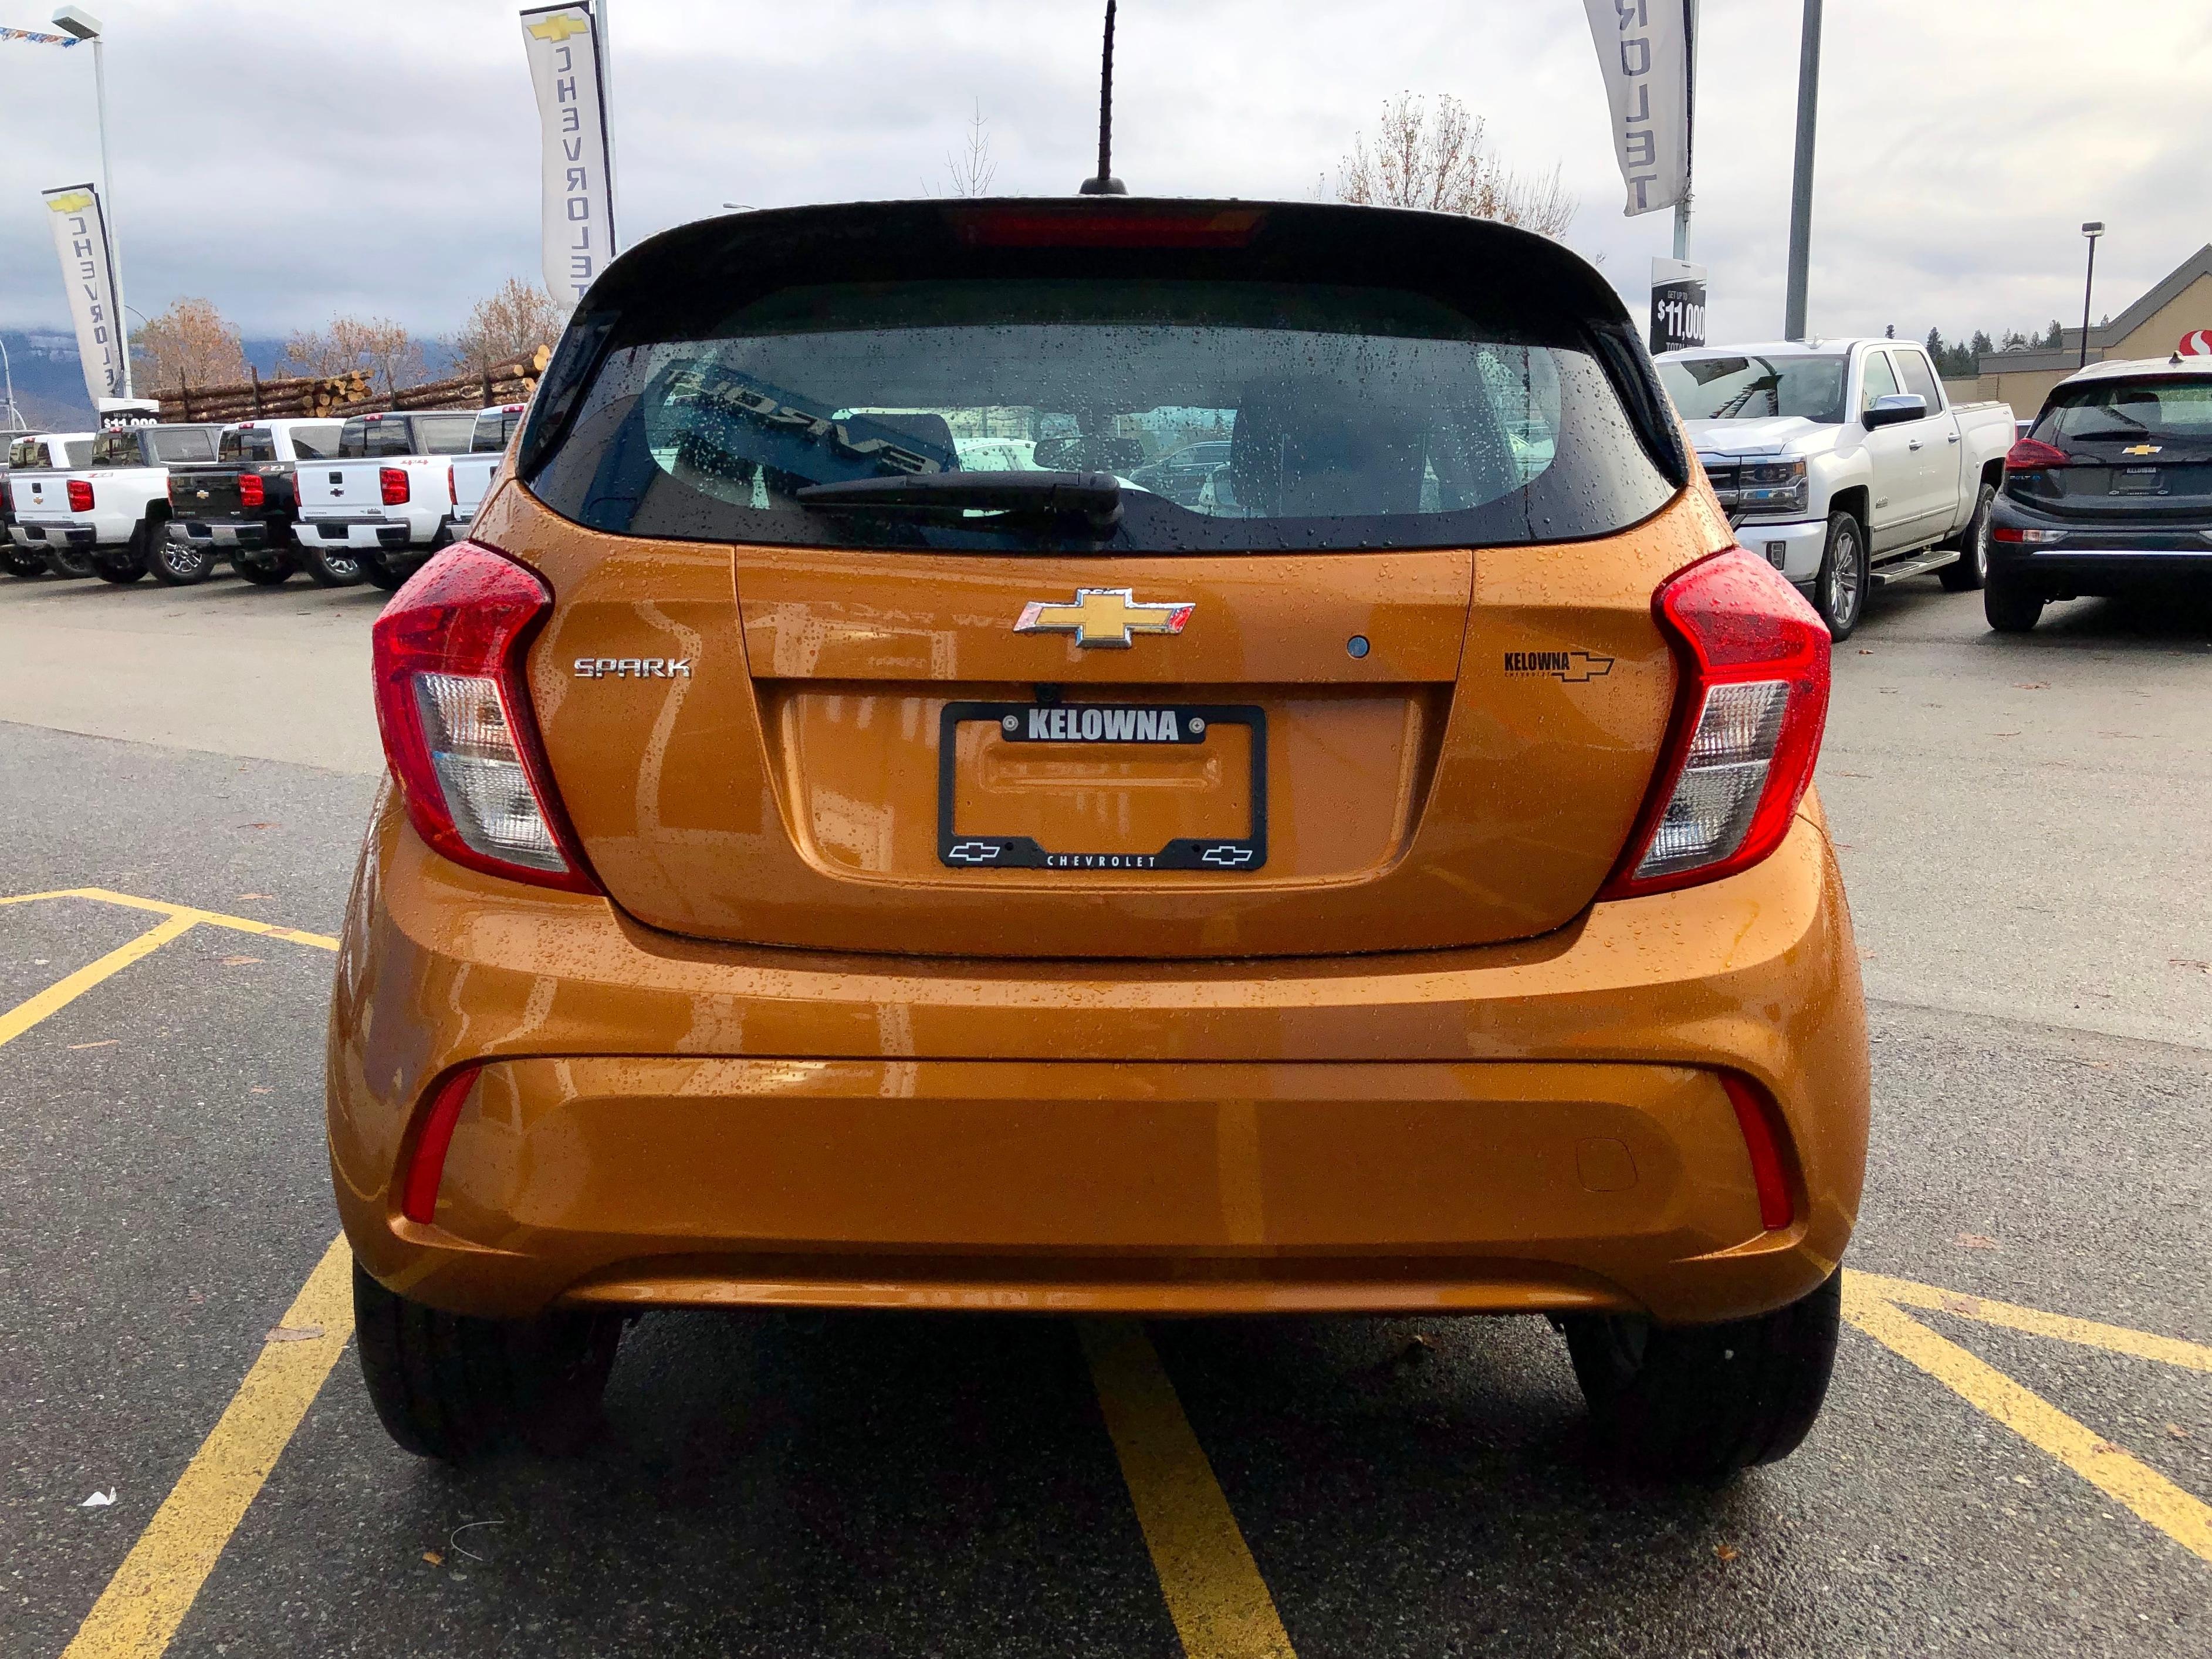 New 2019 Chevrolet Spark In Kelowna Bc At S Exterior Ls Cvt Hatchback